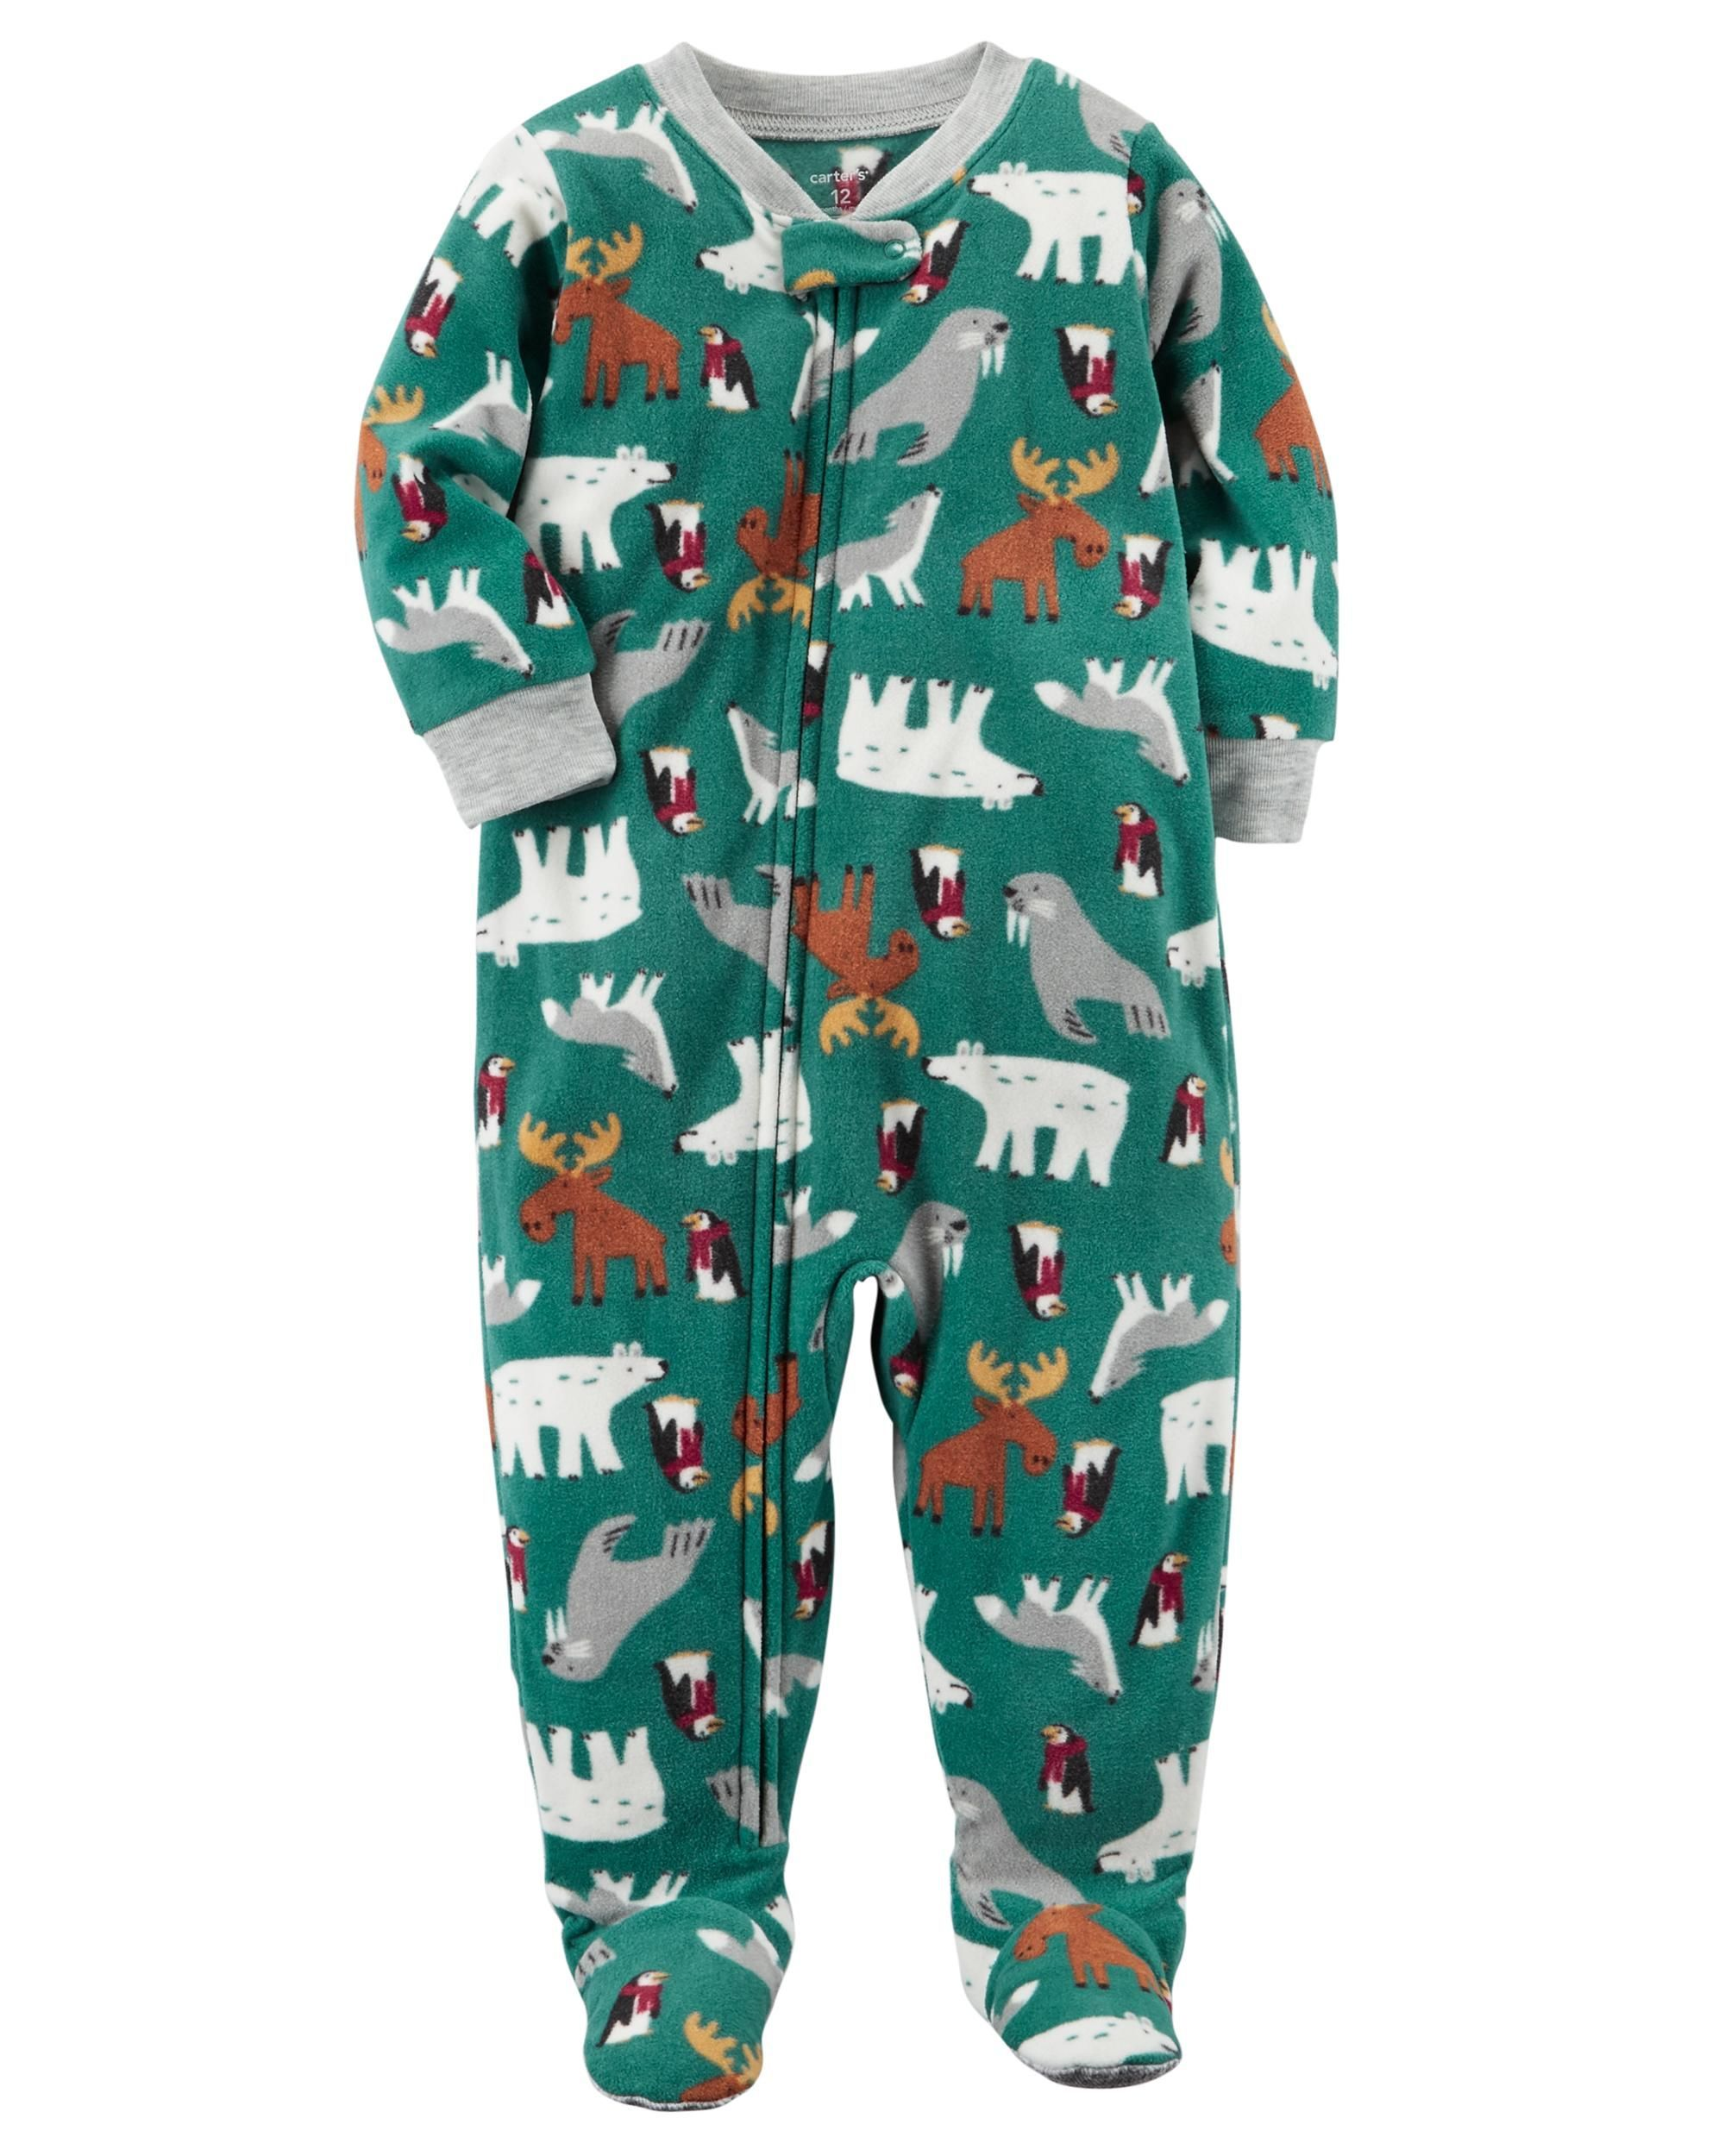 c6a79c5d0 1-Piece Winter Fleece PJs